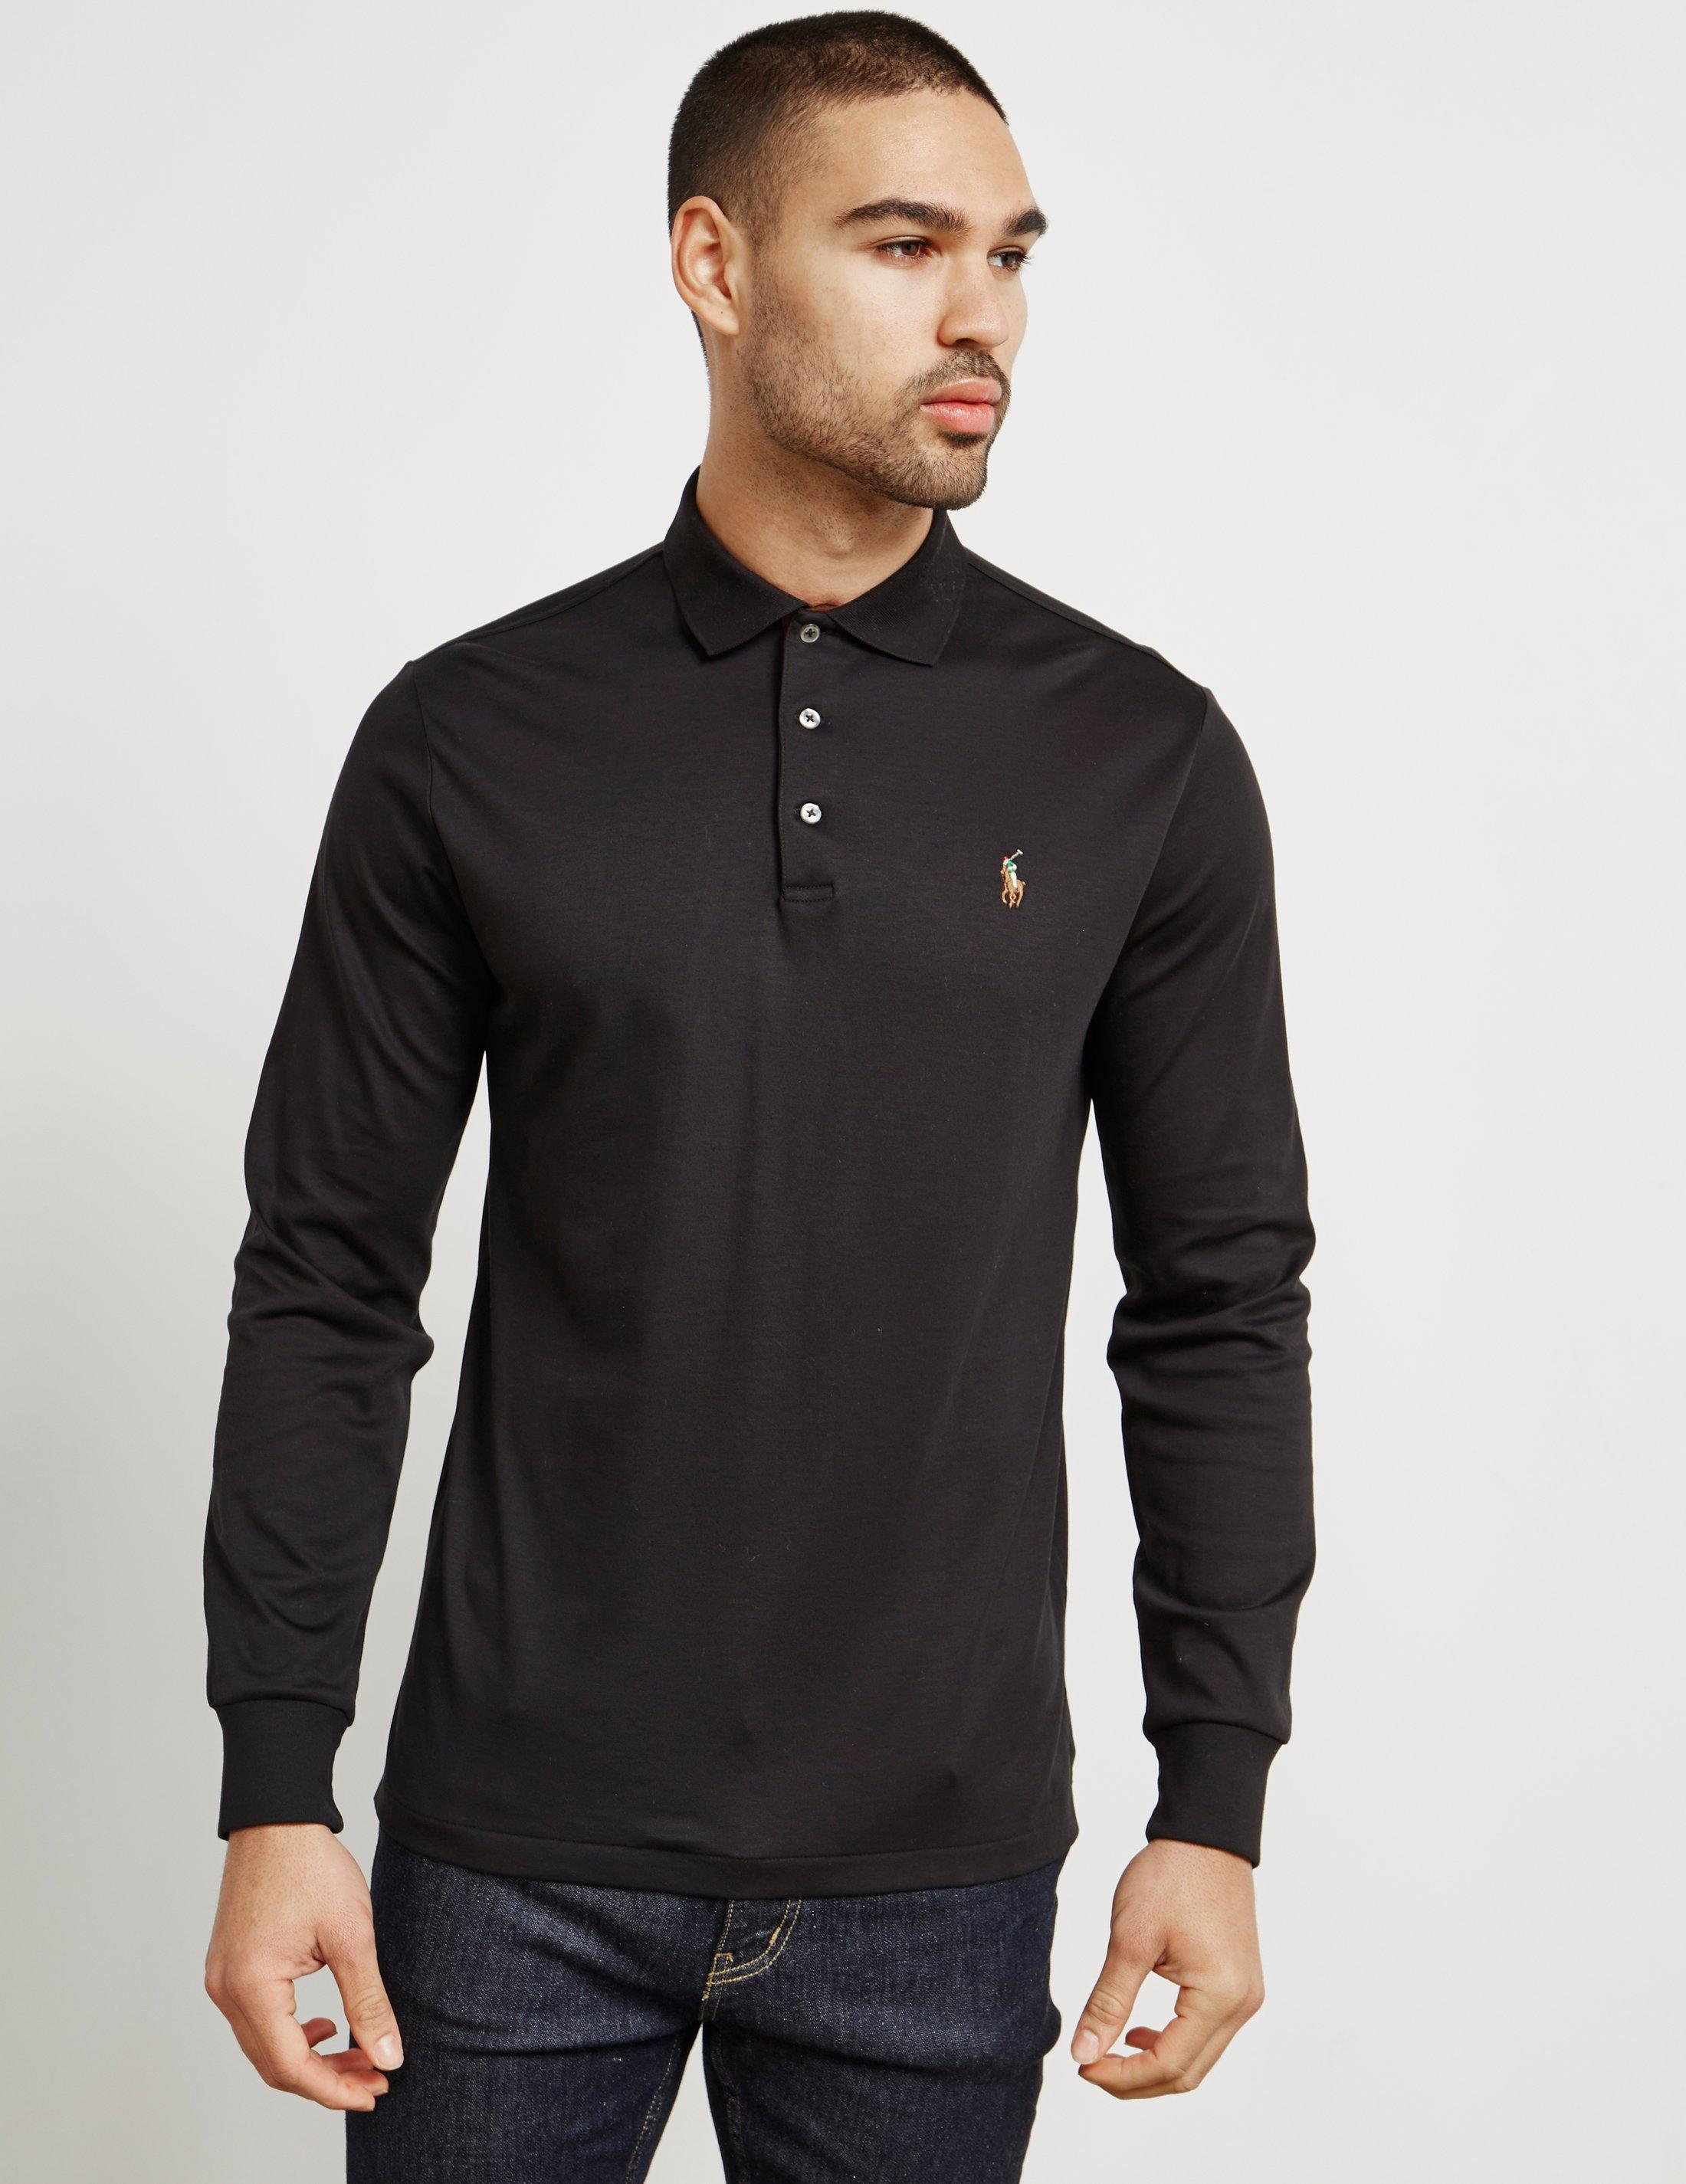 Mens Pima Cotton Long Sleeve Polo Shirt Black